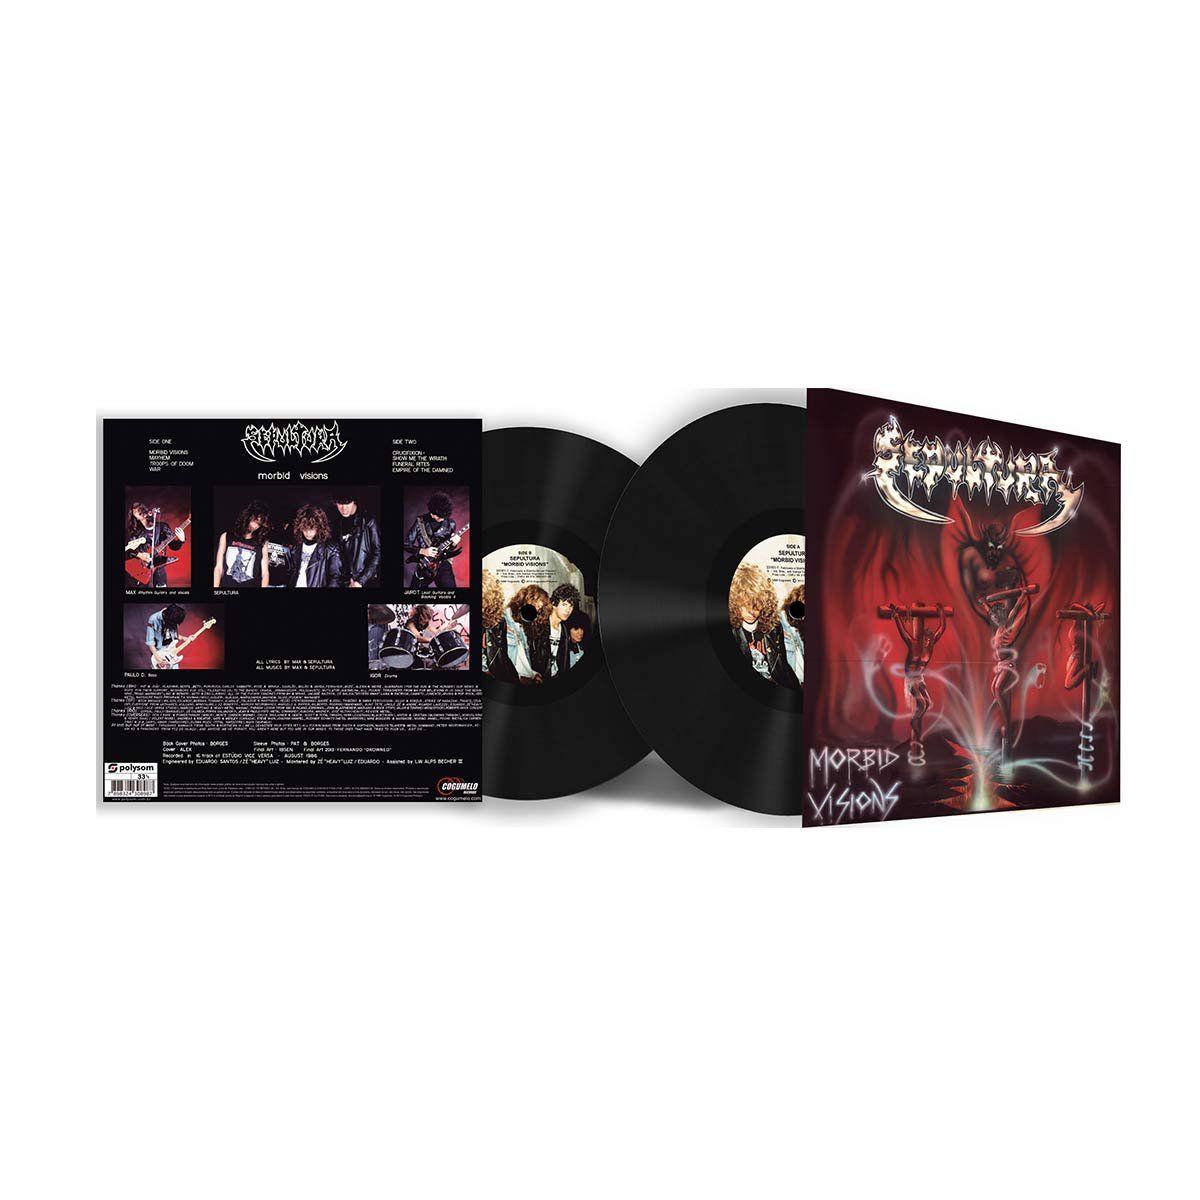 LP Sepultura Morbid Visions  - bandUP Store Marketplace